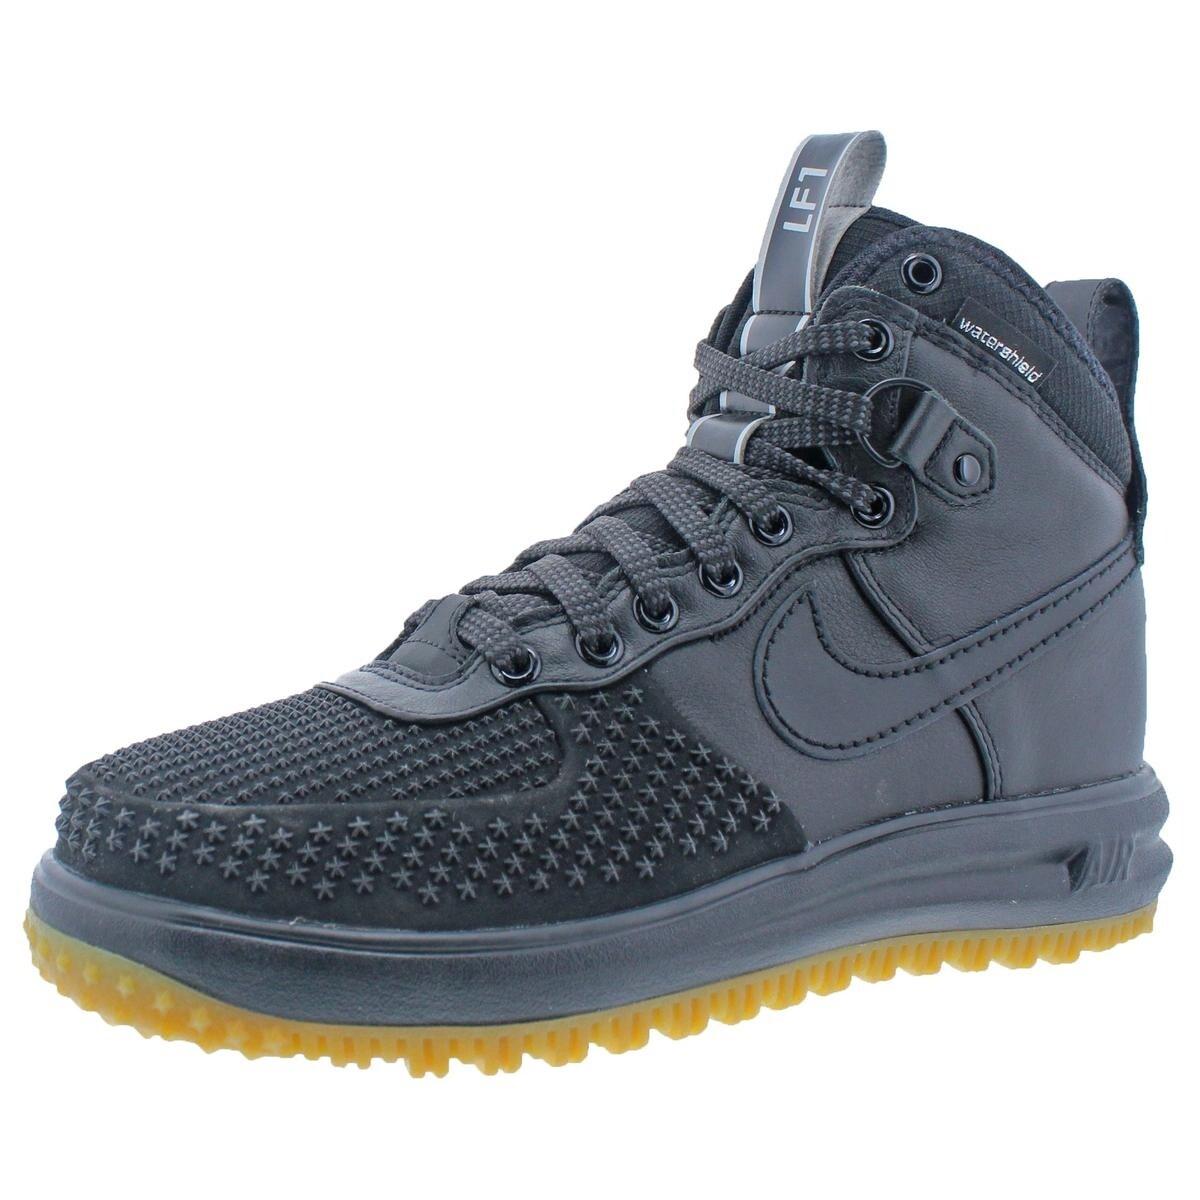 Nike Mens Lunar Force 1 Duckboot